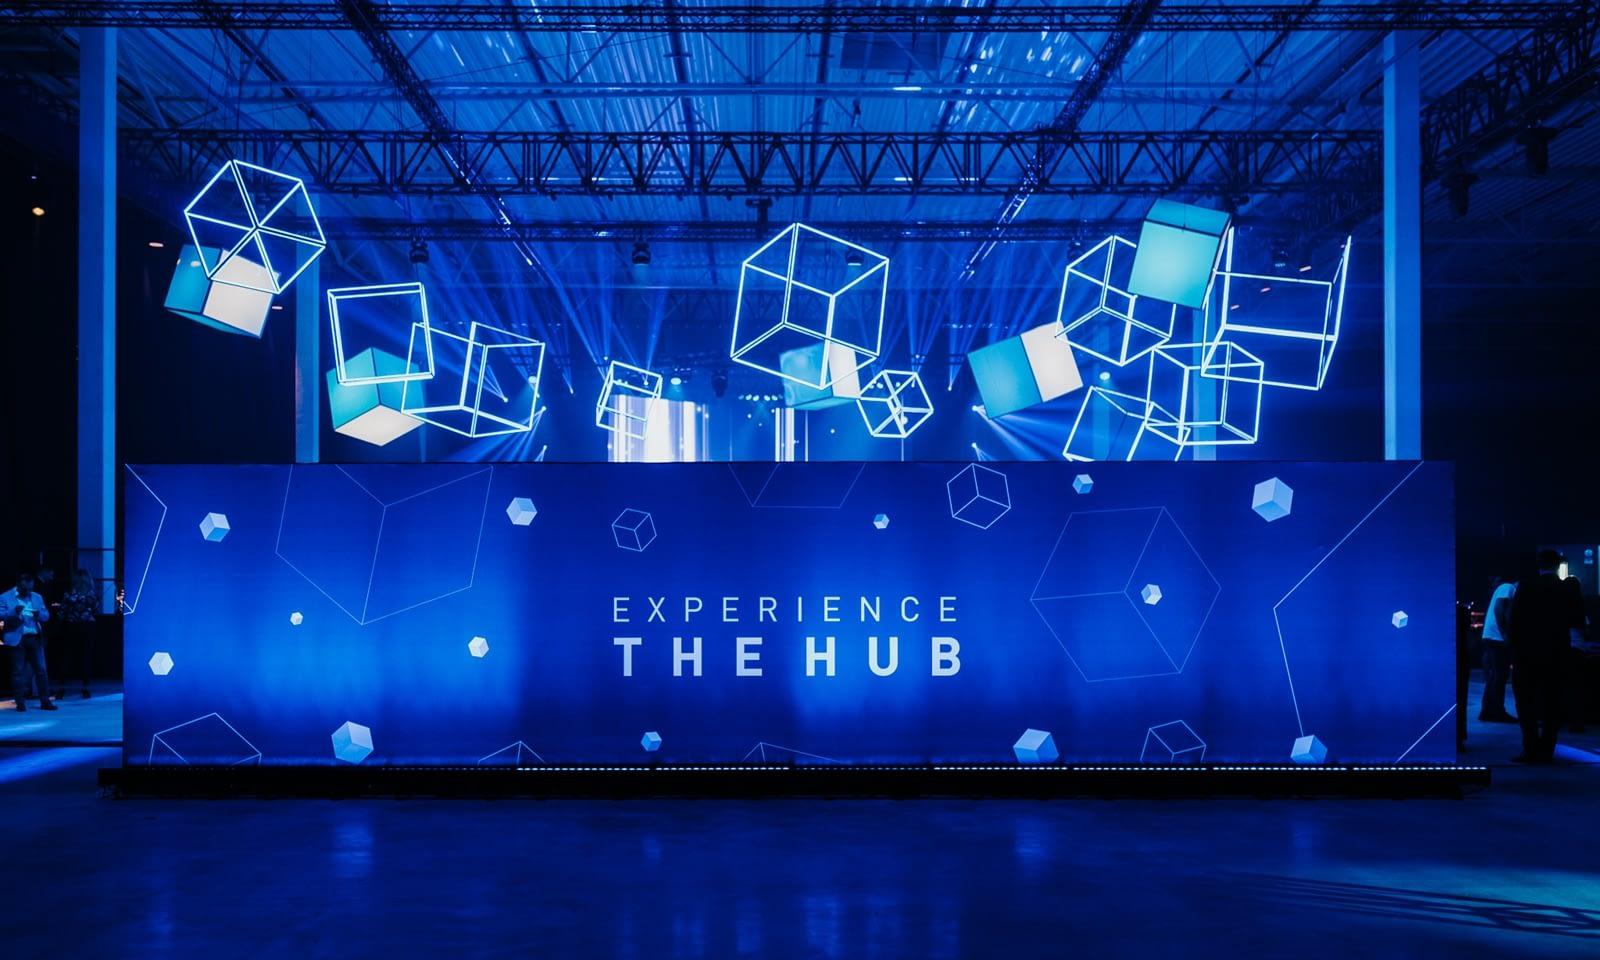 Pannatoni Europe Experience the hub Brill AV Media